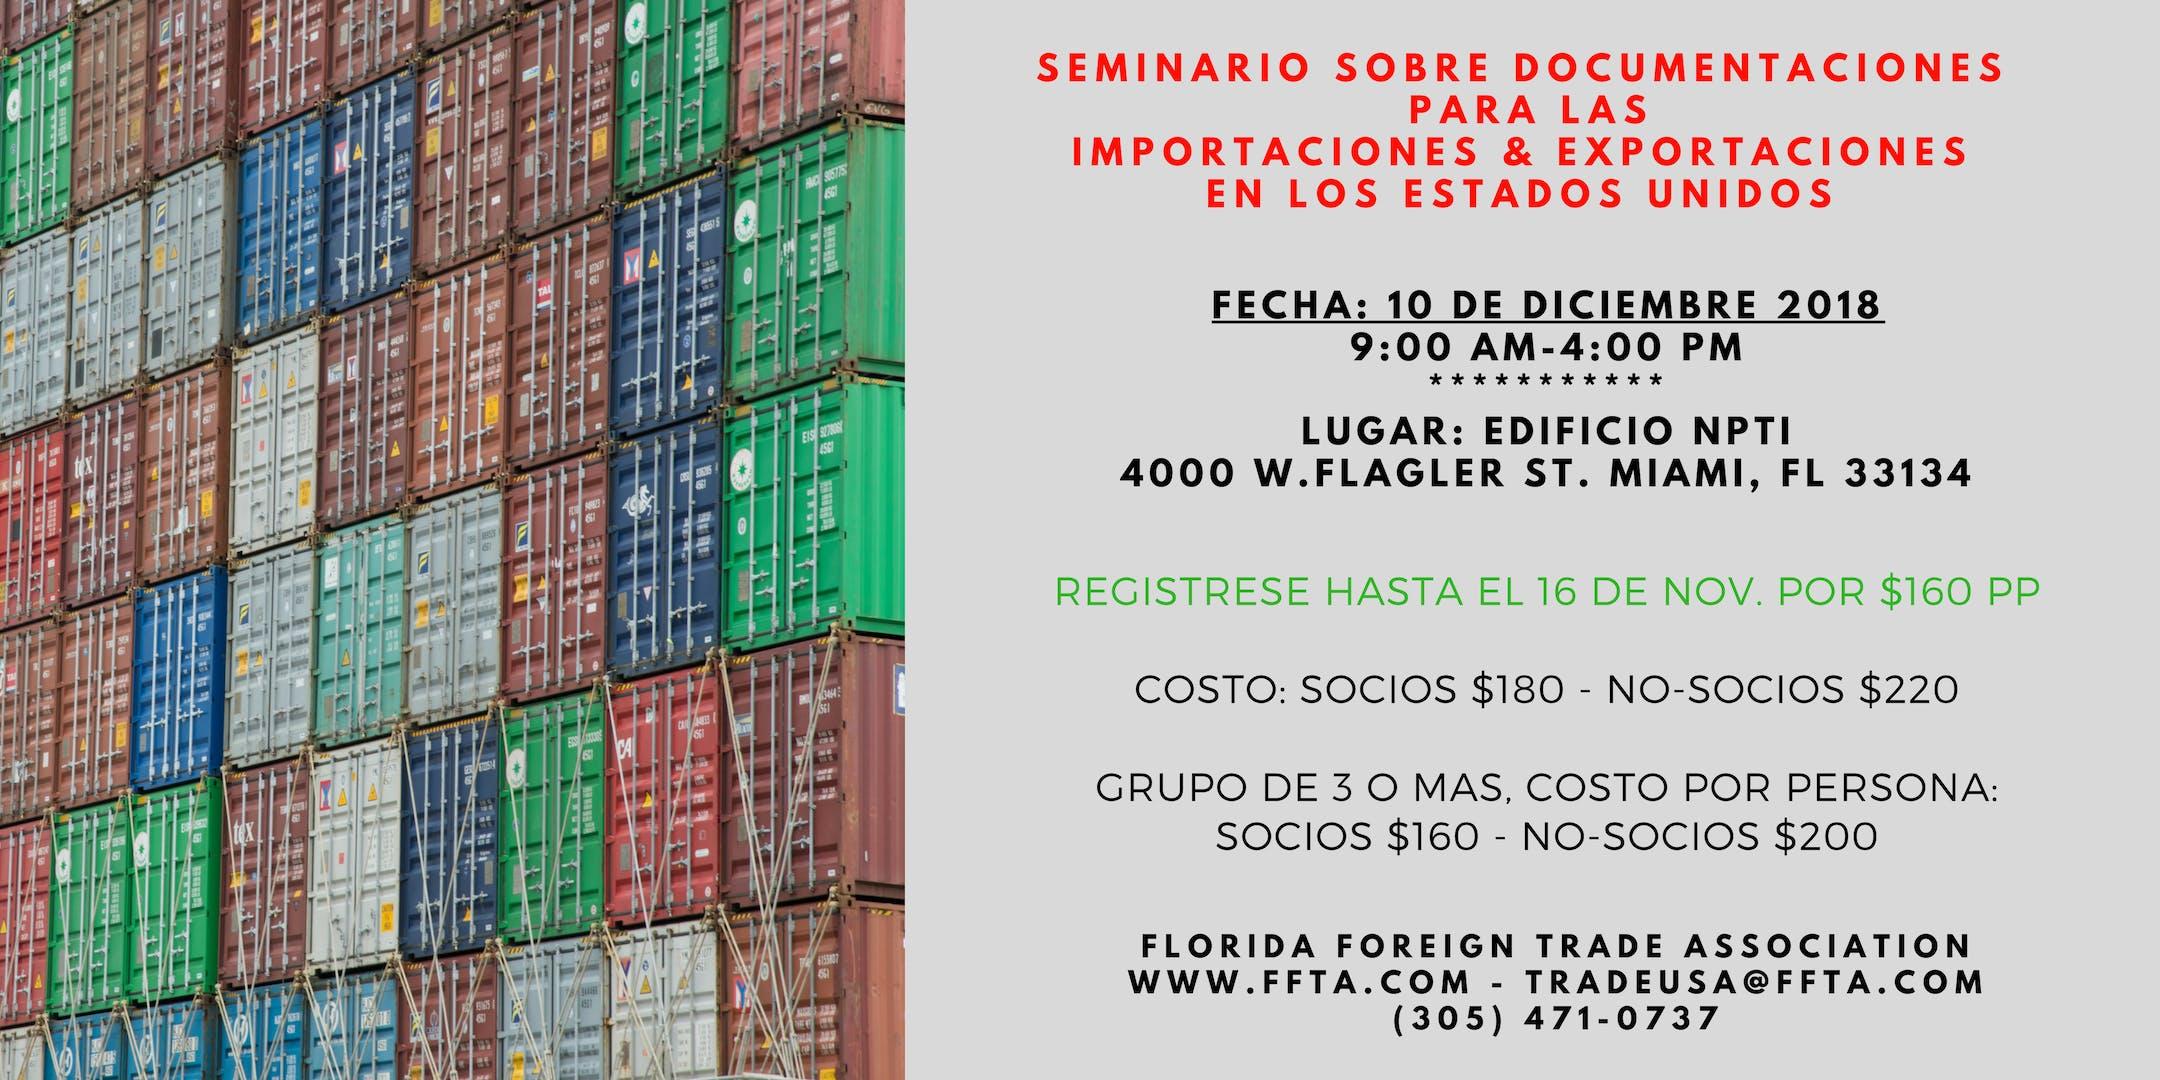 Seminario en Diciembre 10 sobre Documentacion